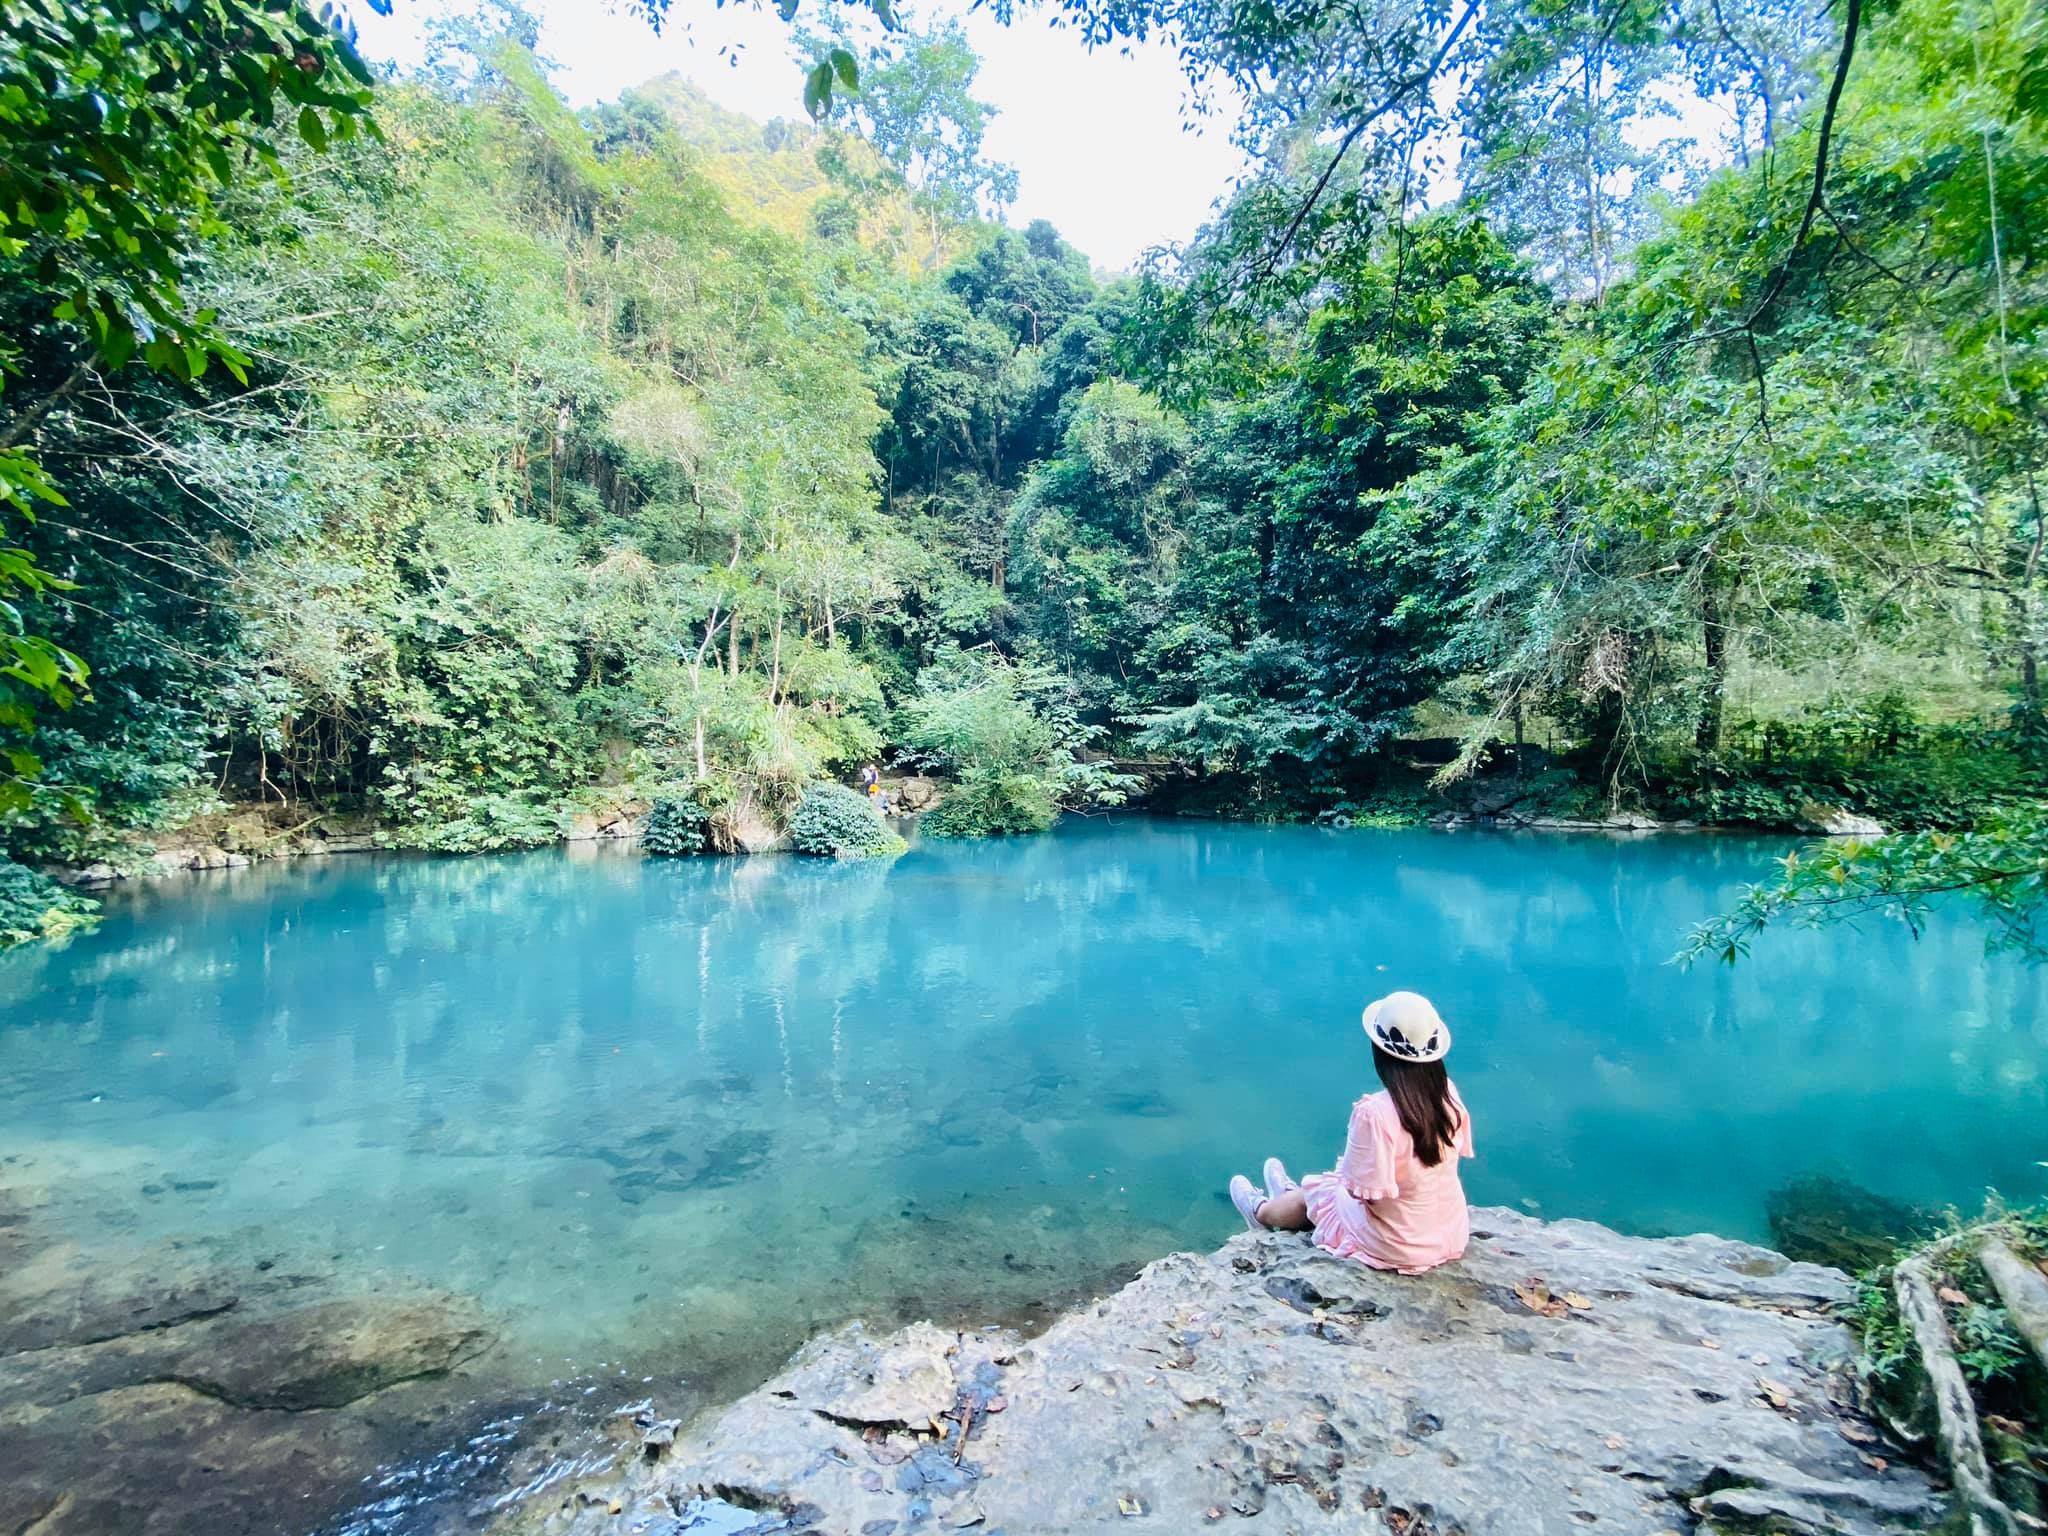 Suoi-le-nin-nang-tho-cua-manh-dat-cao-bang-vietmountain-travel4